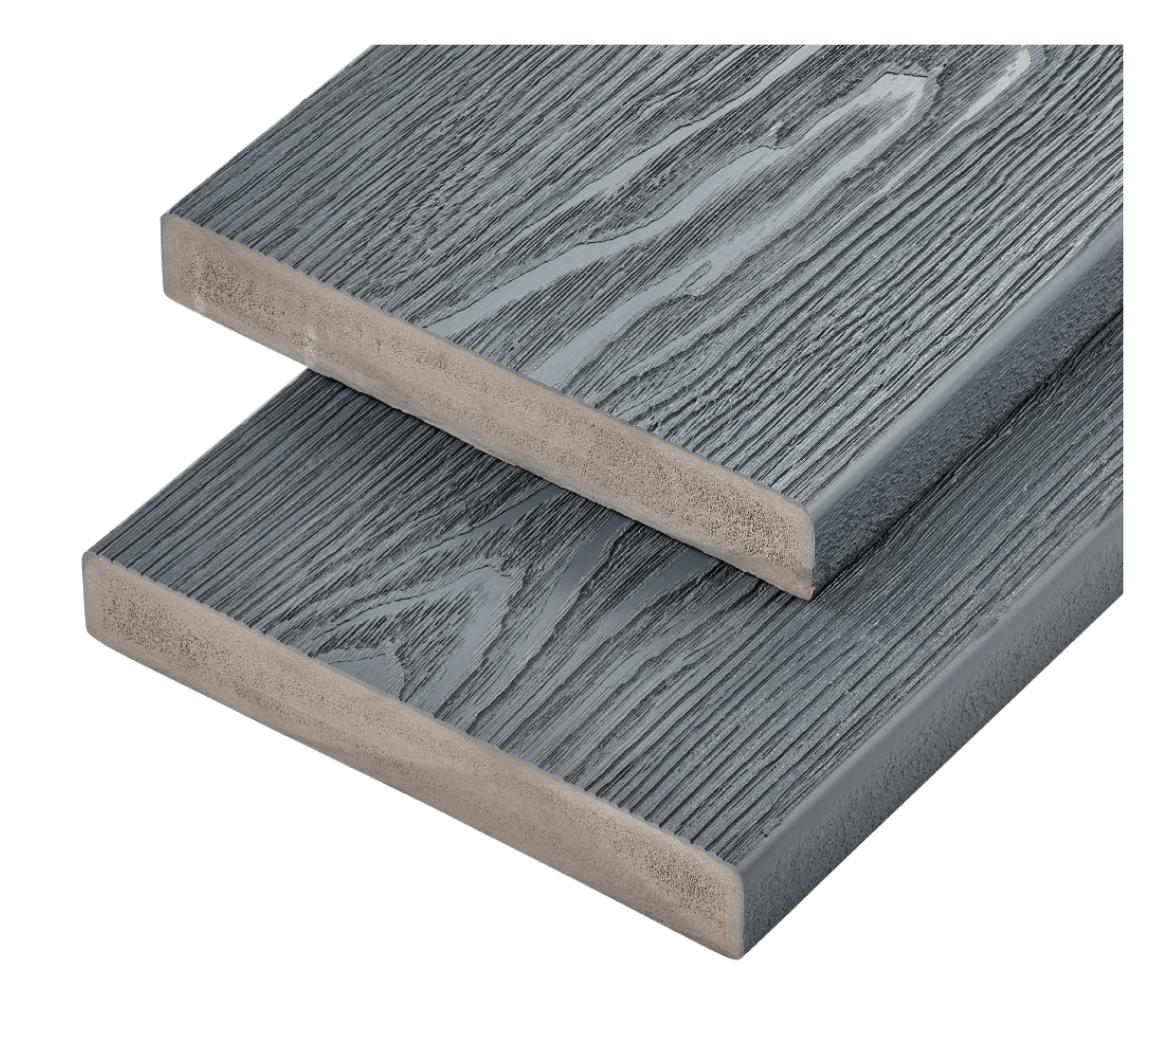 Capstock PVC-ASA Woodgrain Effect Premium Grade Decking Board